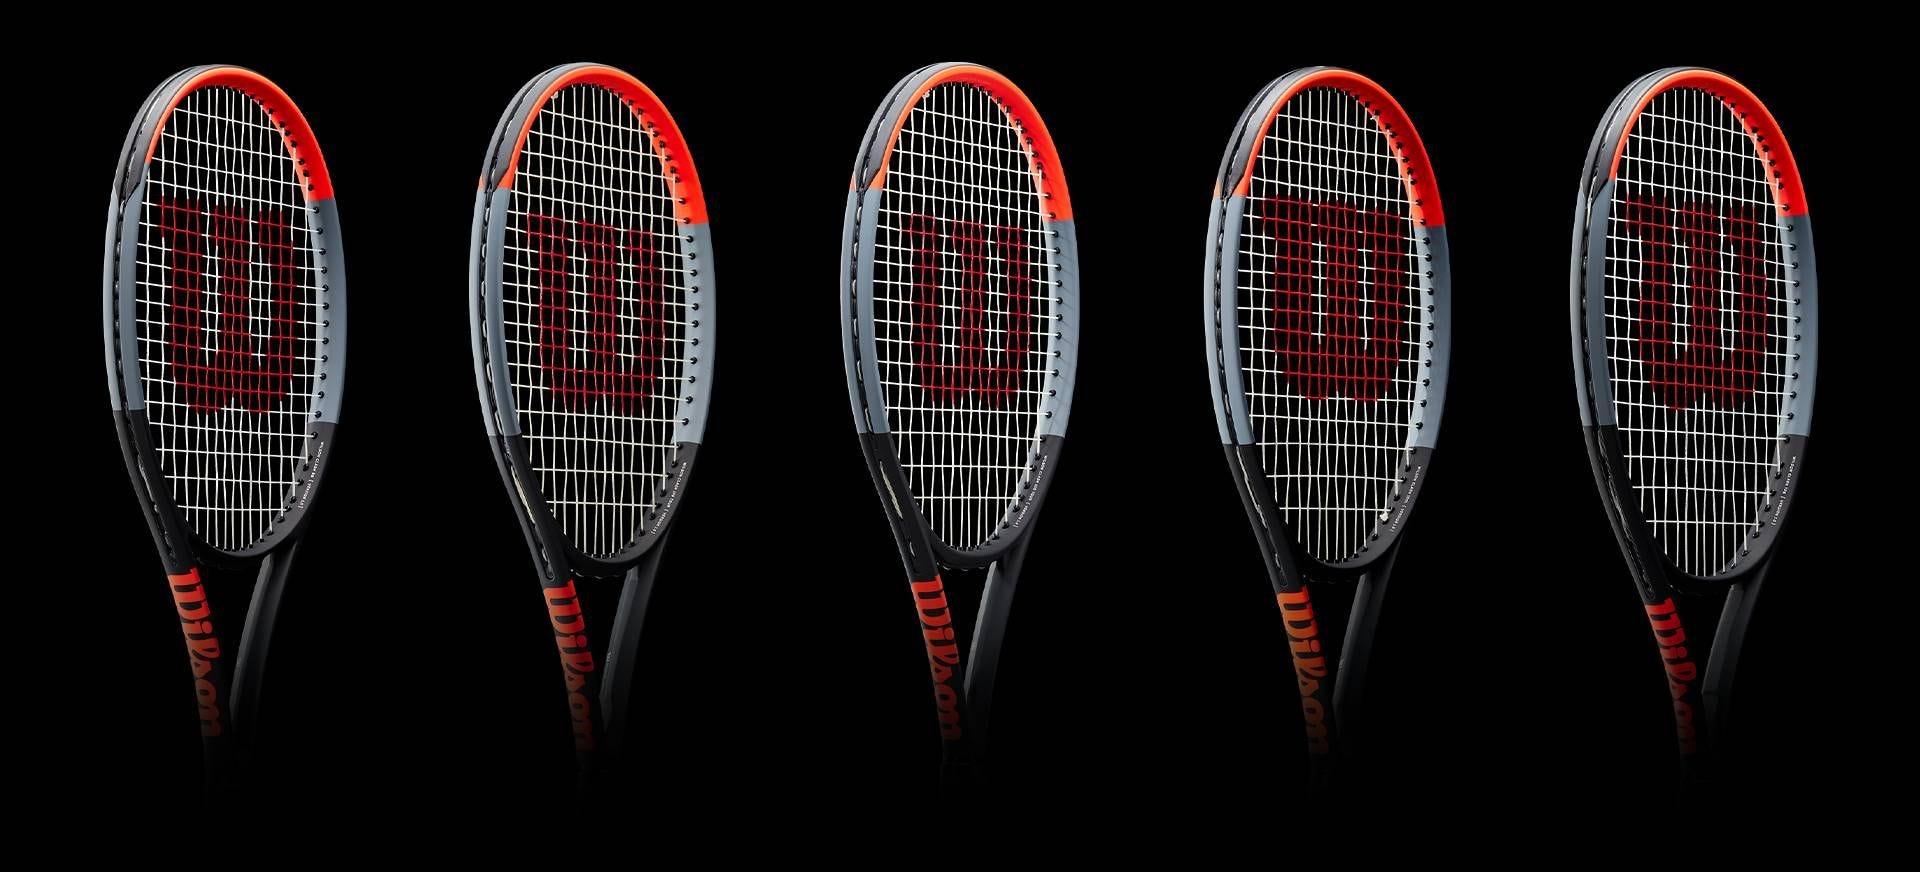 Tennis Anyone Mens Tie Clip Tack Bar